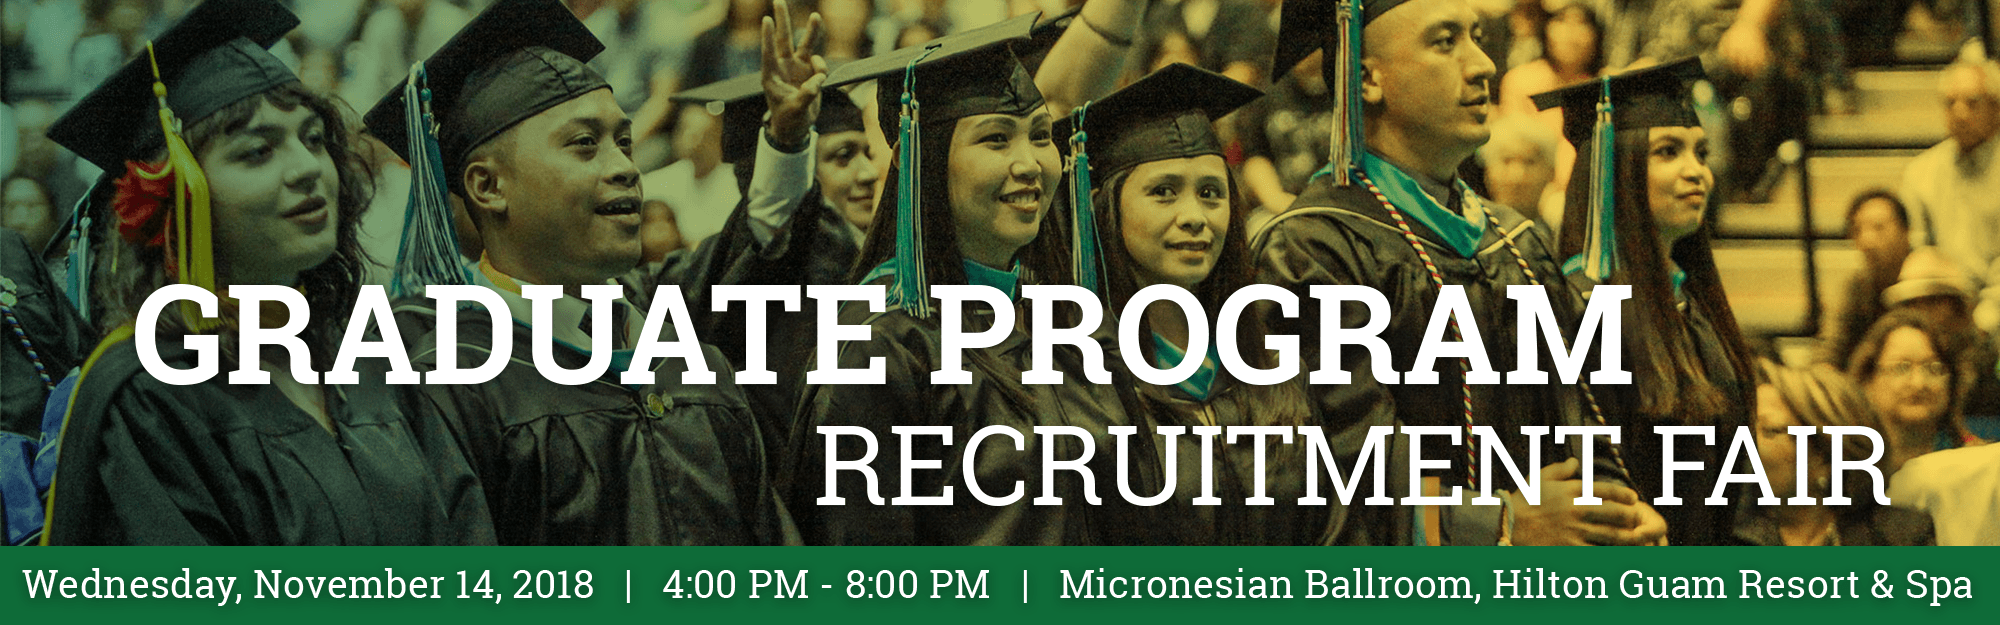 Graduate Program Recruitment Fair